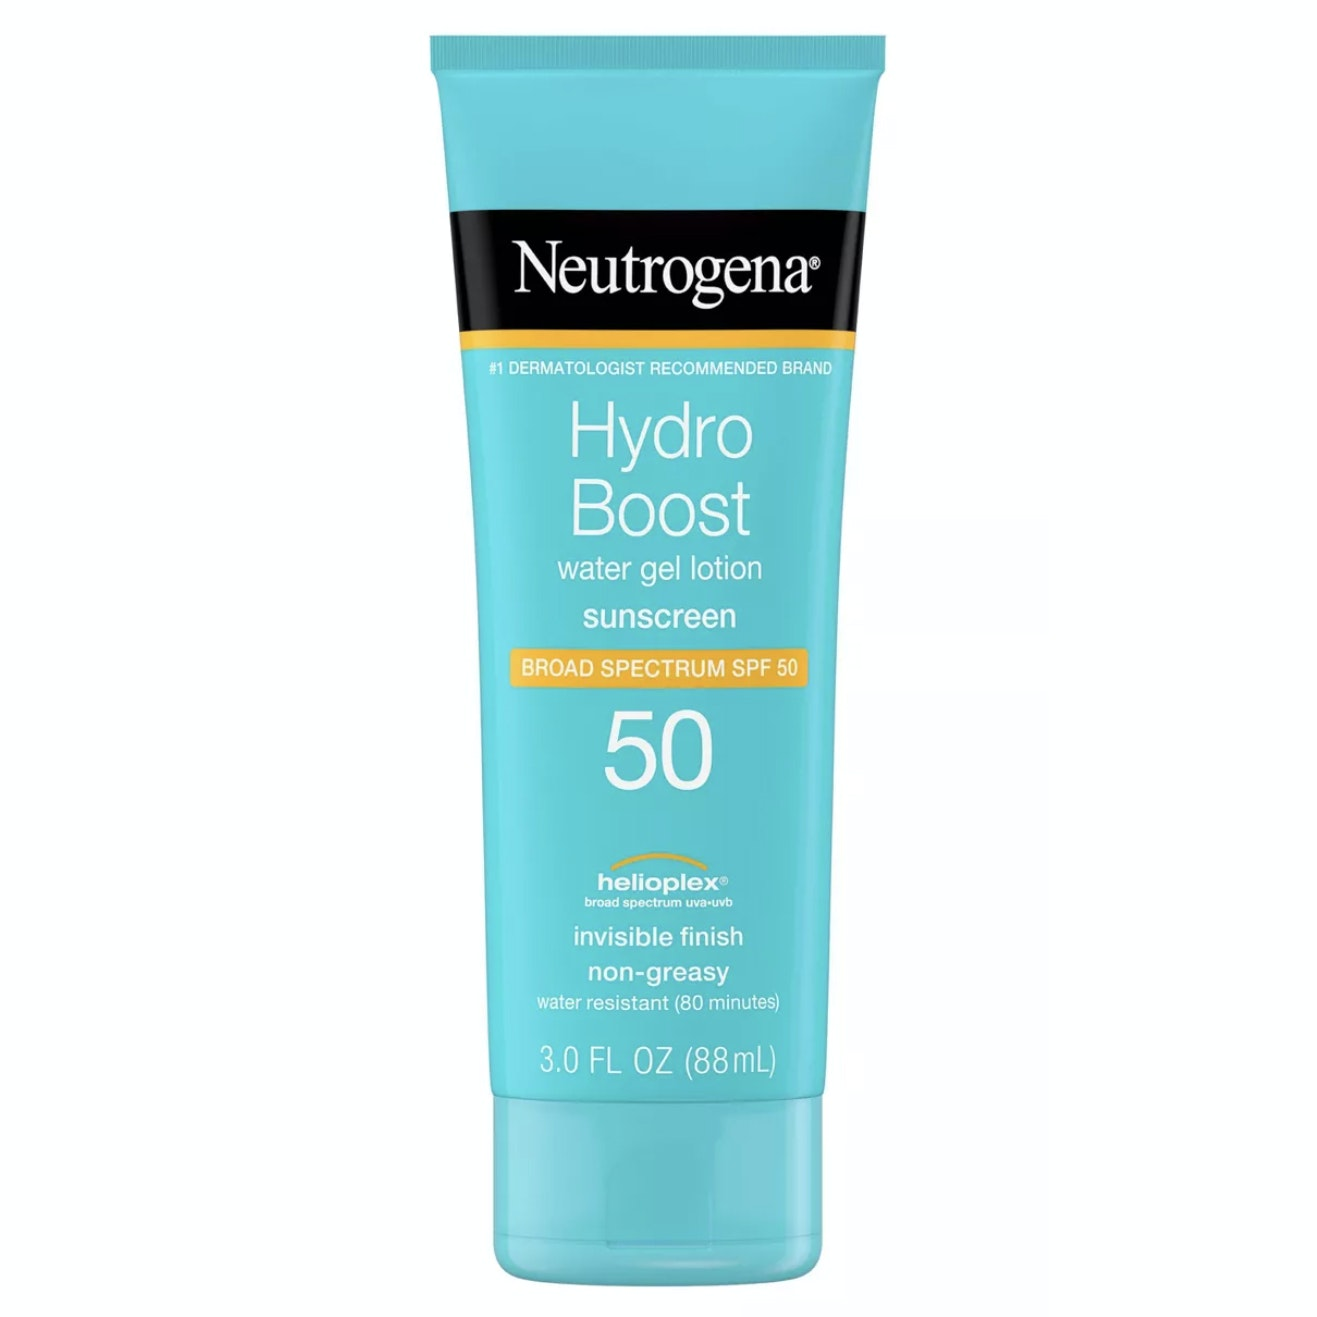 Neutrogena® Hydro Boost Water Gel Lotion Sunscreen SPF 50